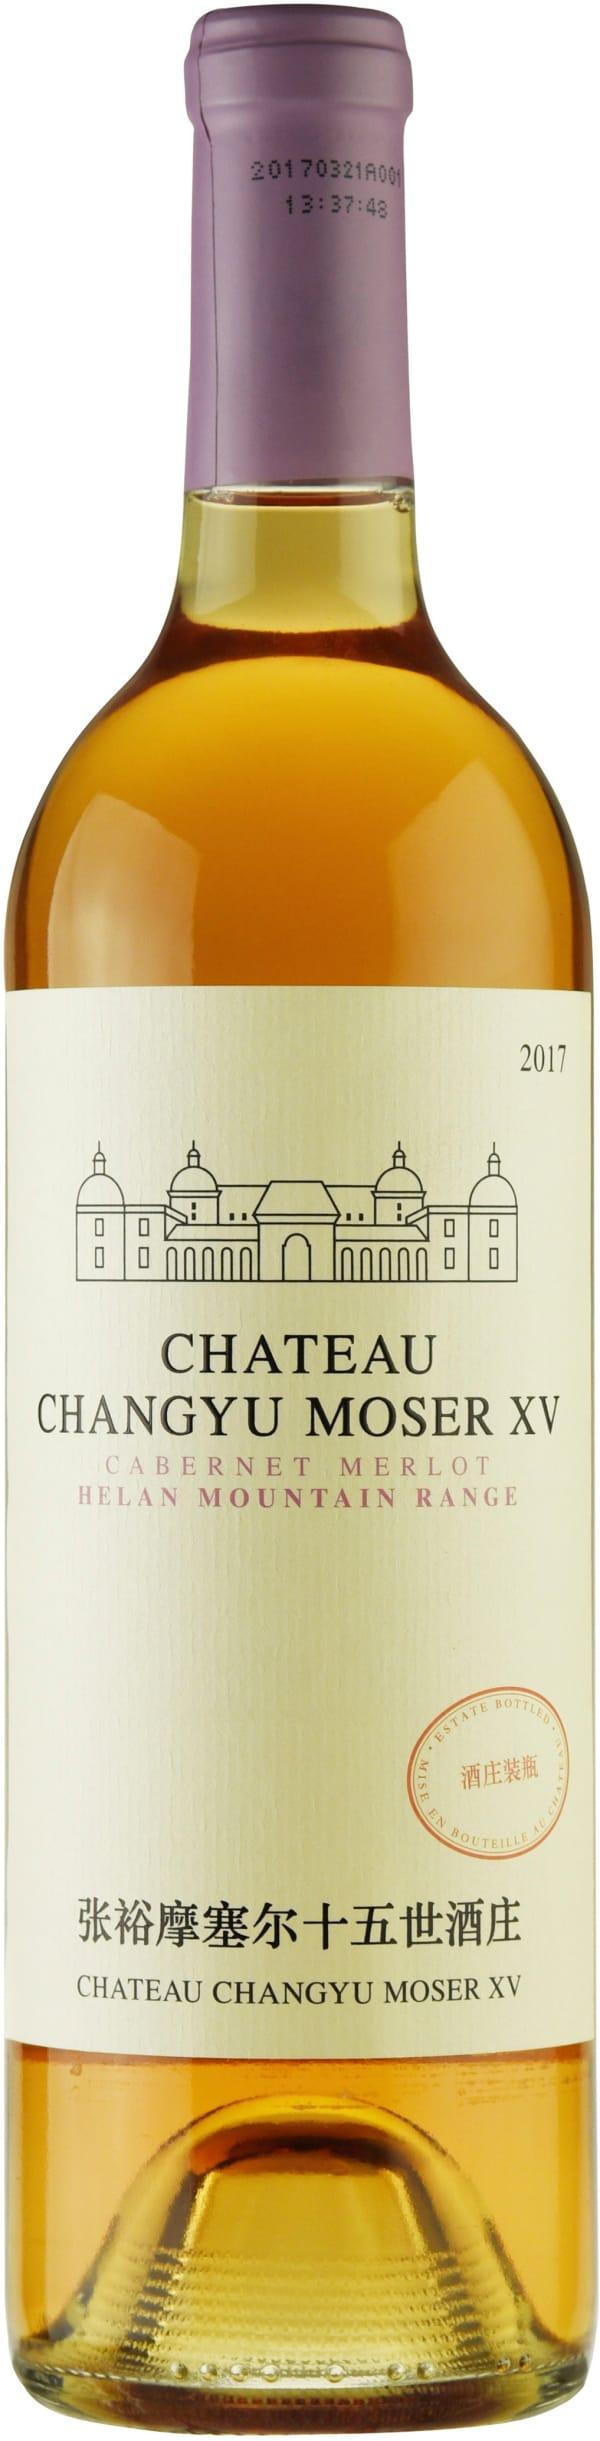 Moser XV Helan Mountain Cabernet Merlot Rosé